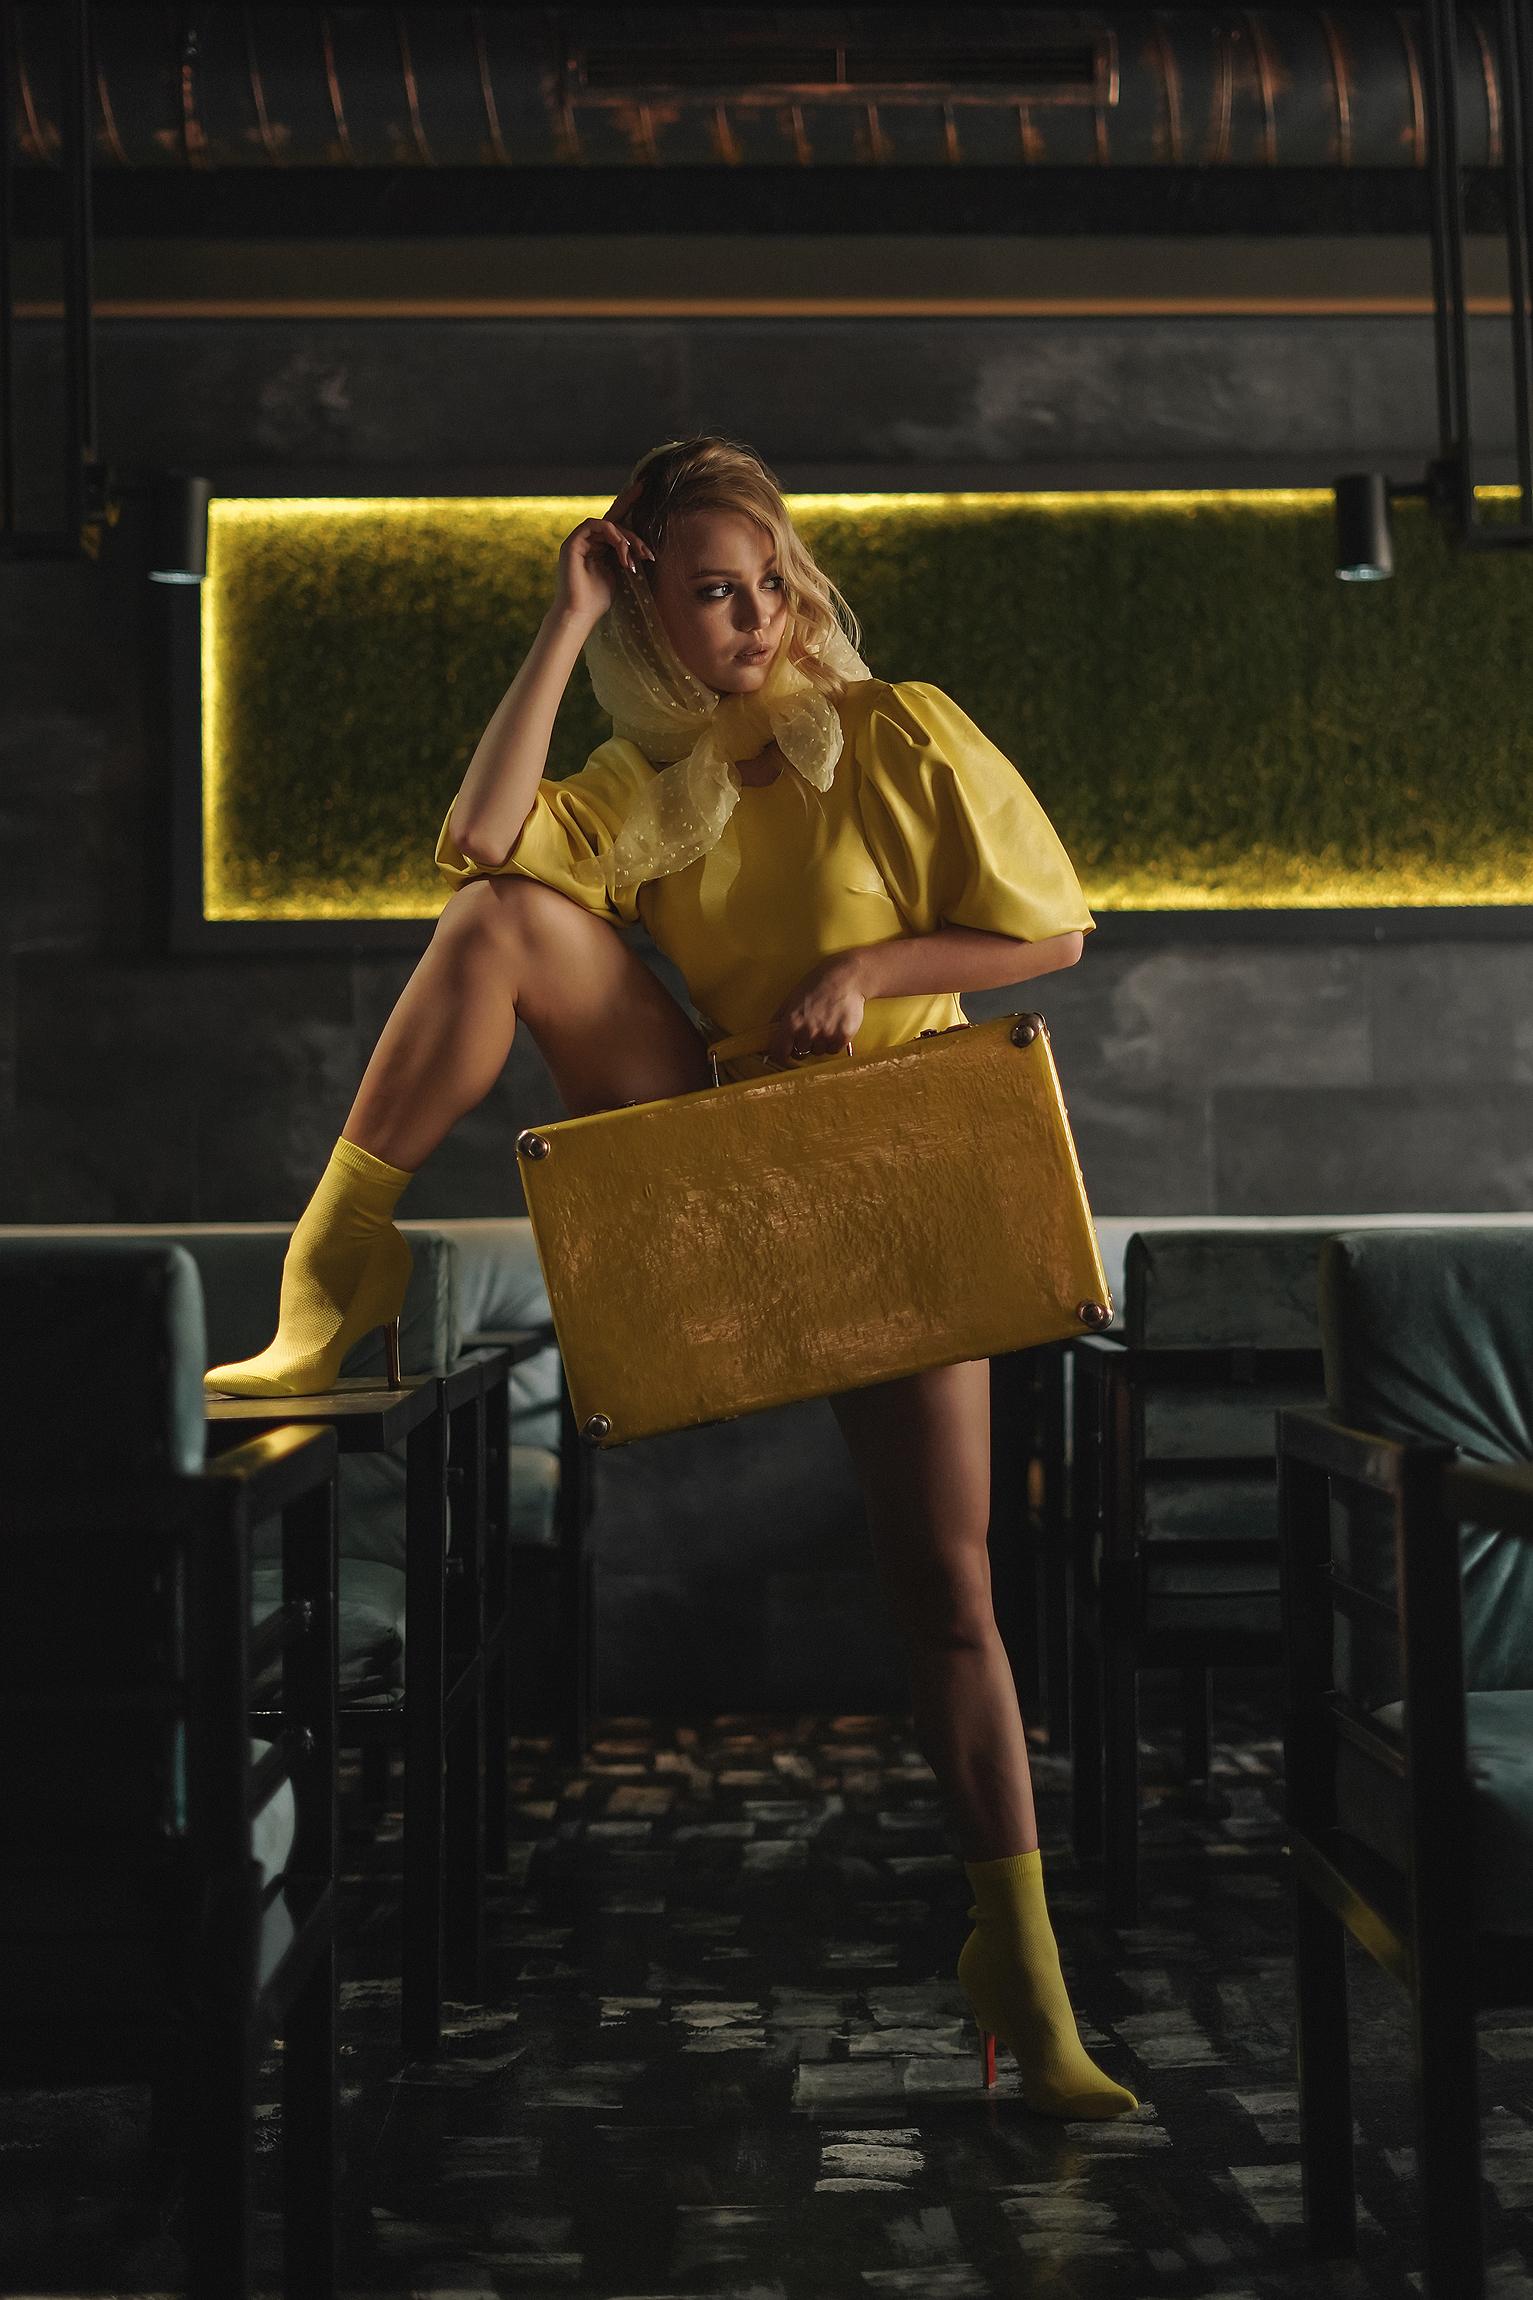 Желтые ботинки / фотограф Photographyzp Yana